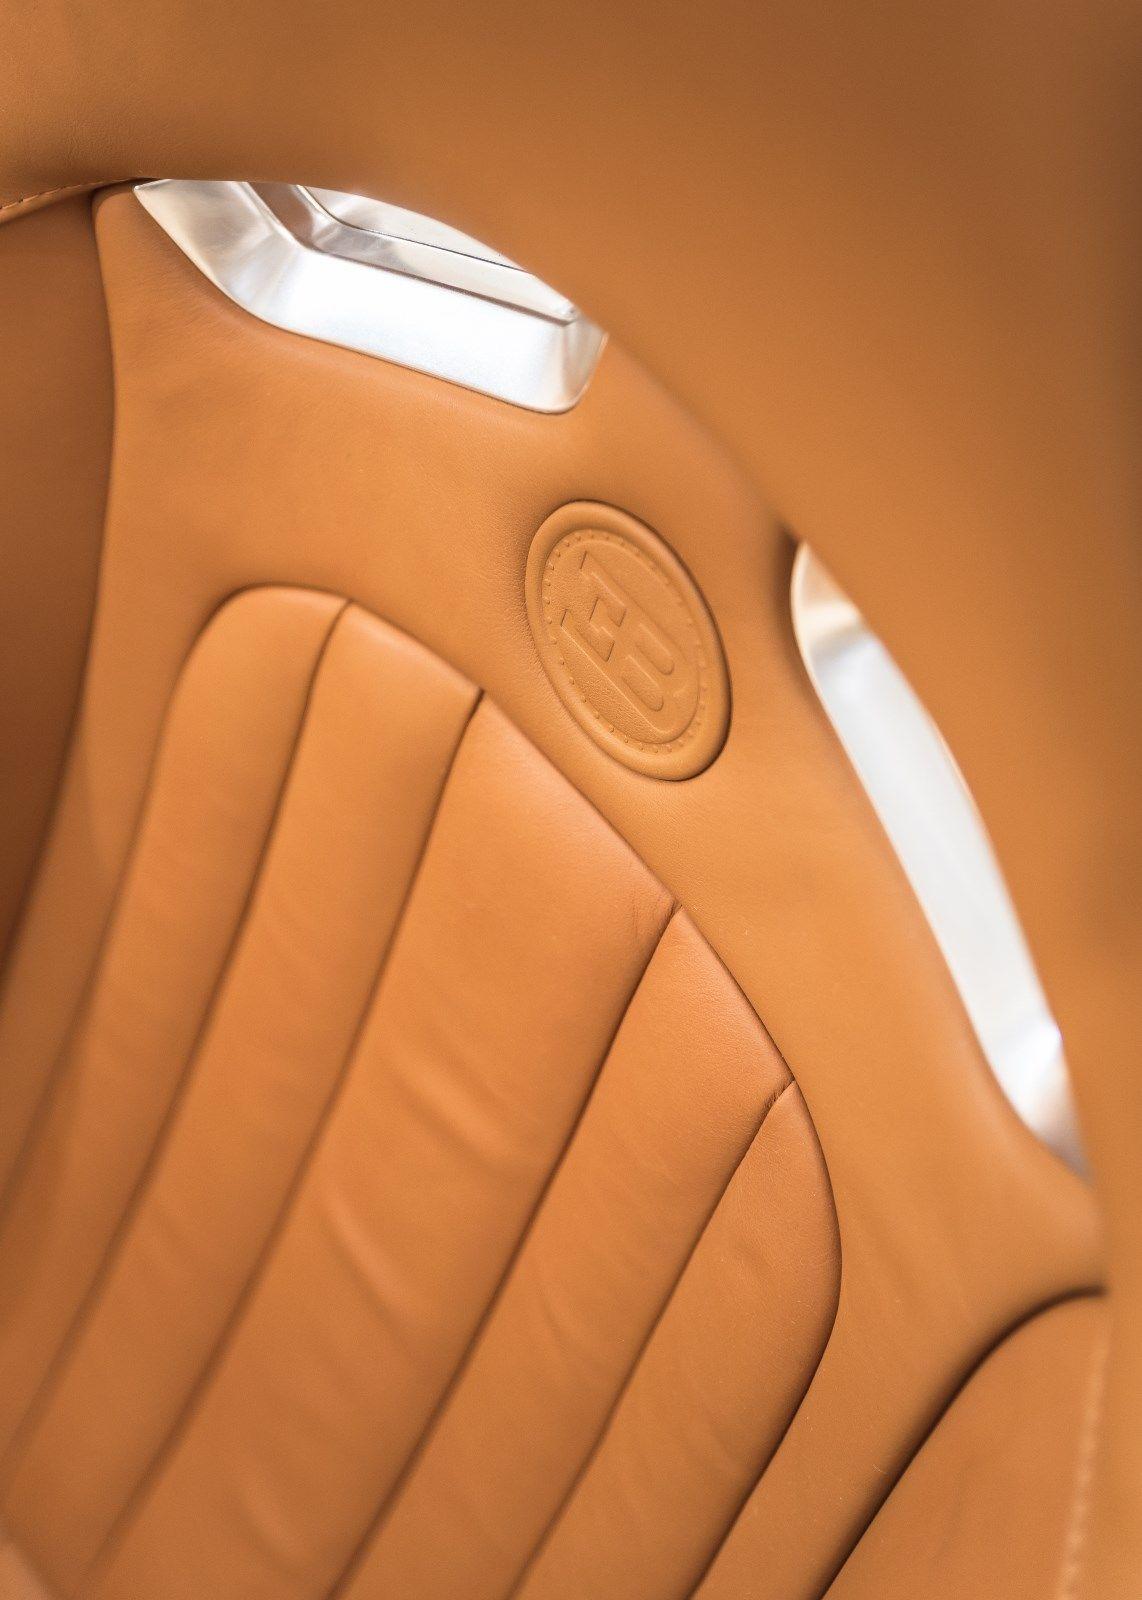 Bugatti Veyron 2008 interior (9)